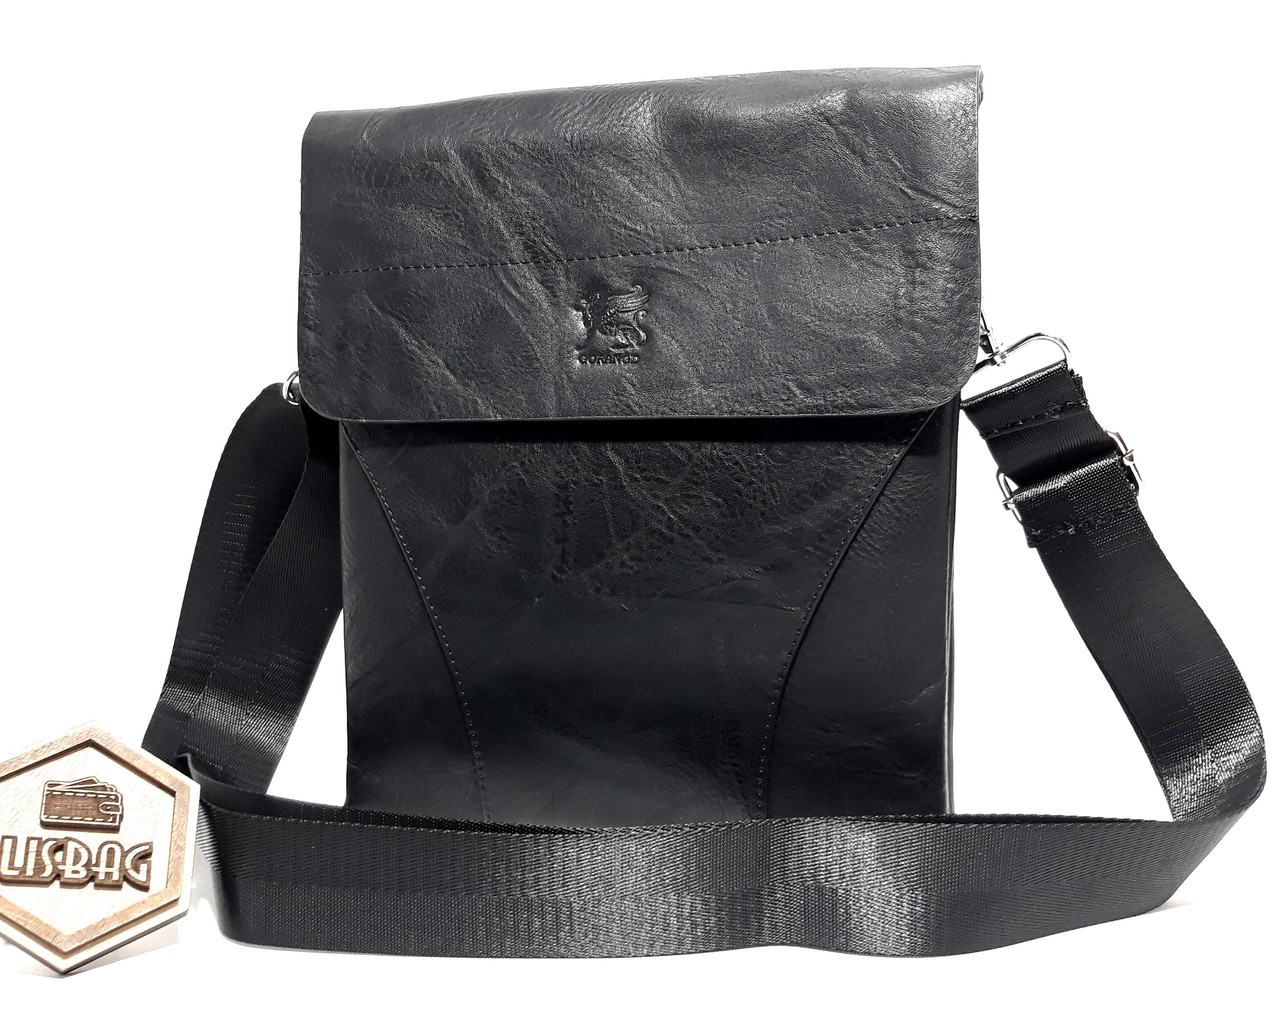 1d0fc816d780 Мужская повседневная стильная сумка планшетка\барсетка Gorangd на 2  отделения , фото 2 ...